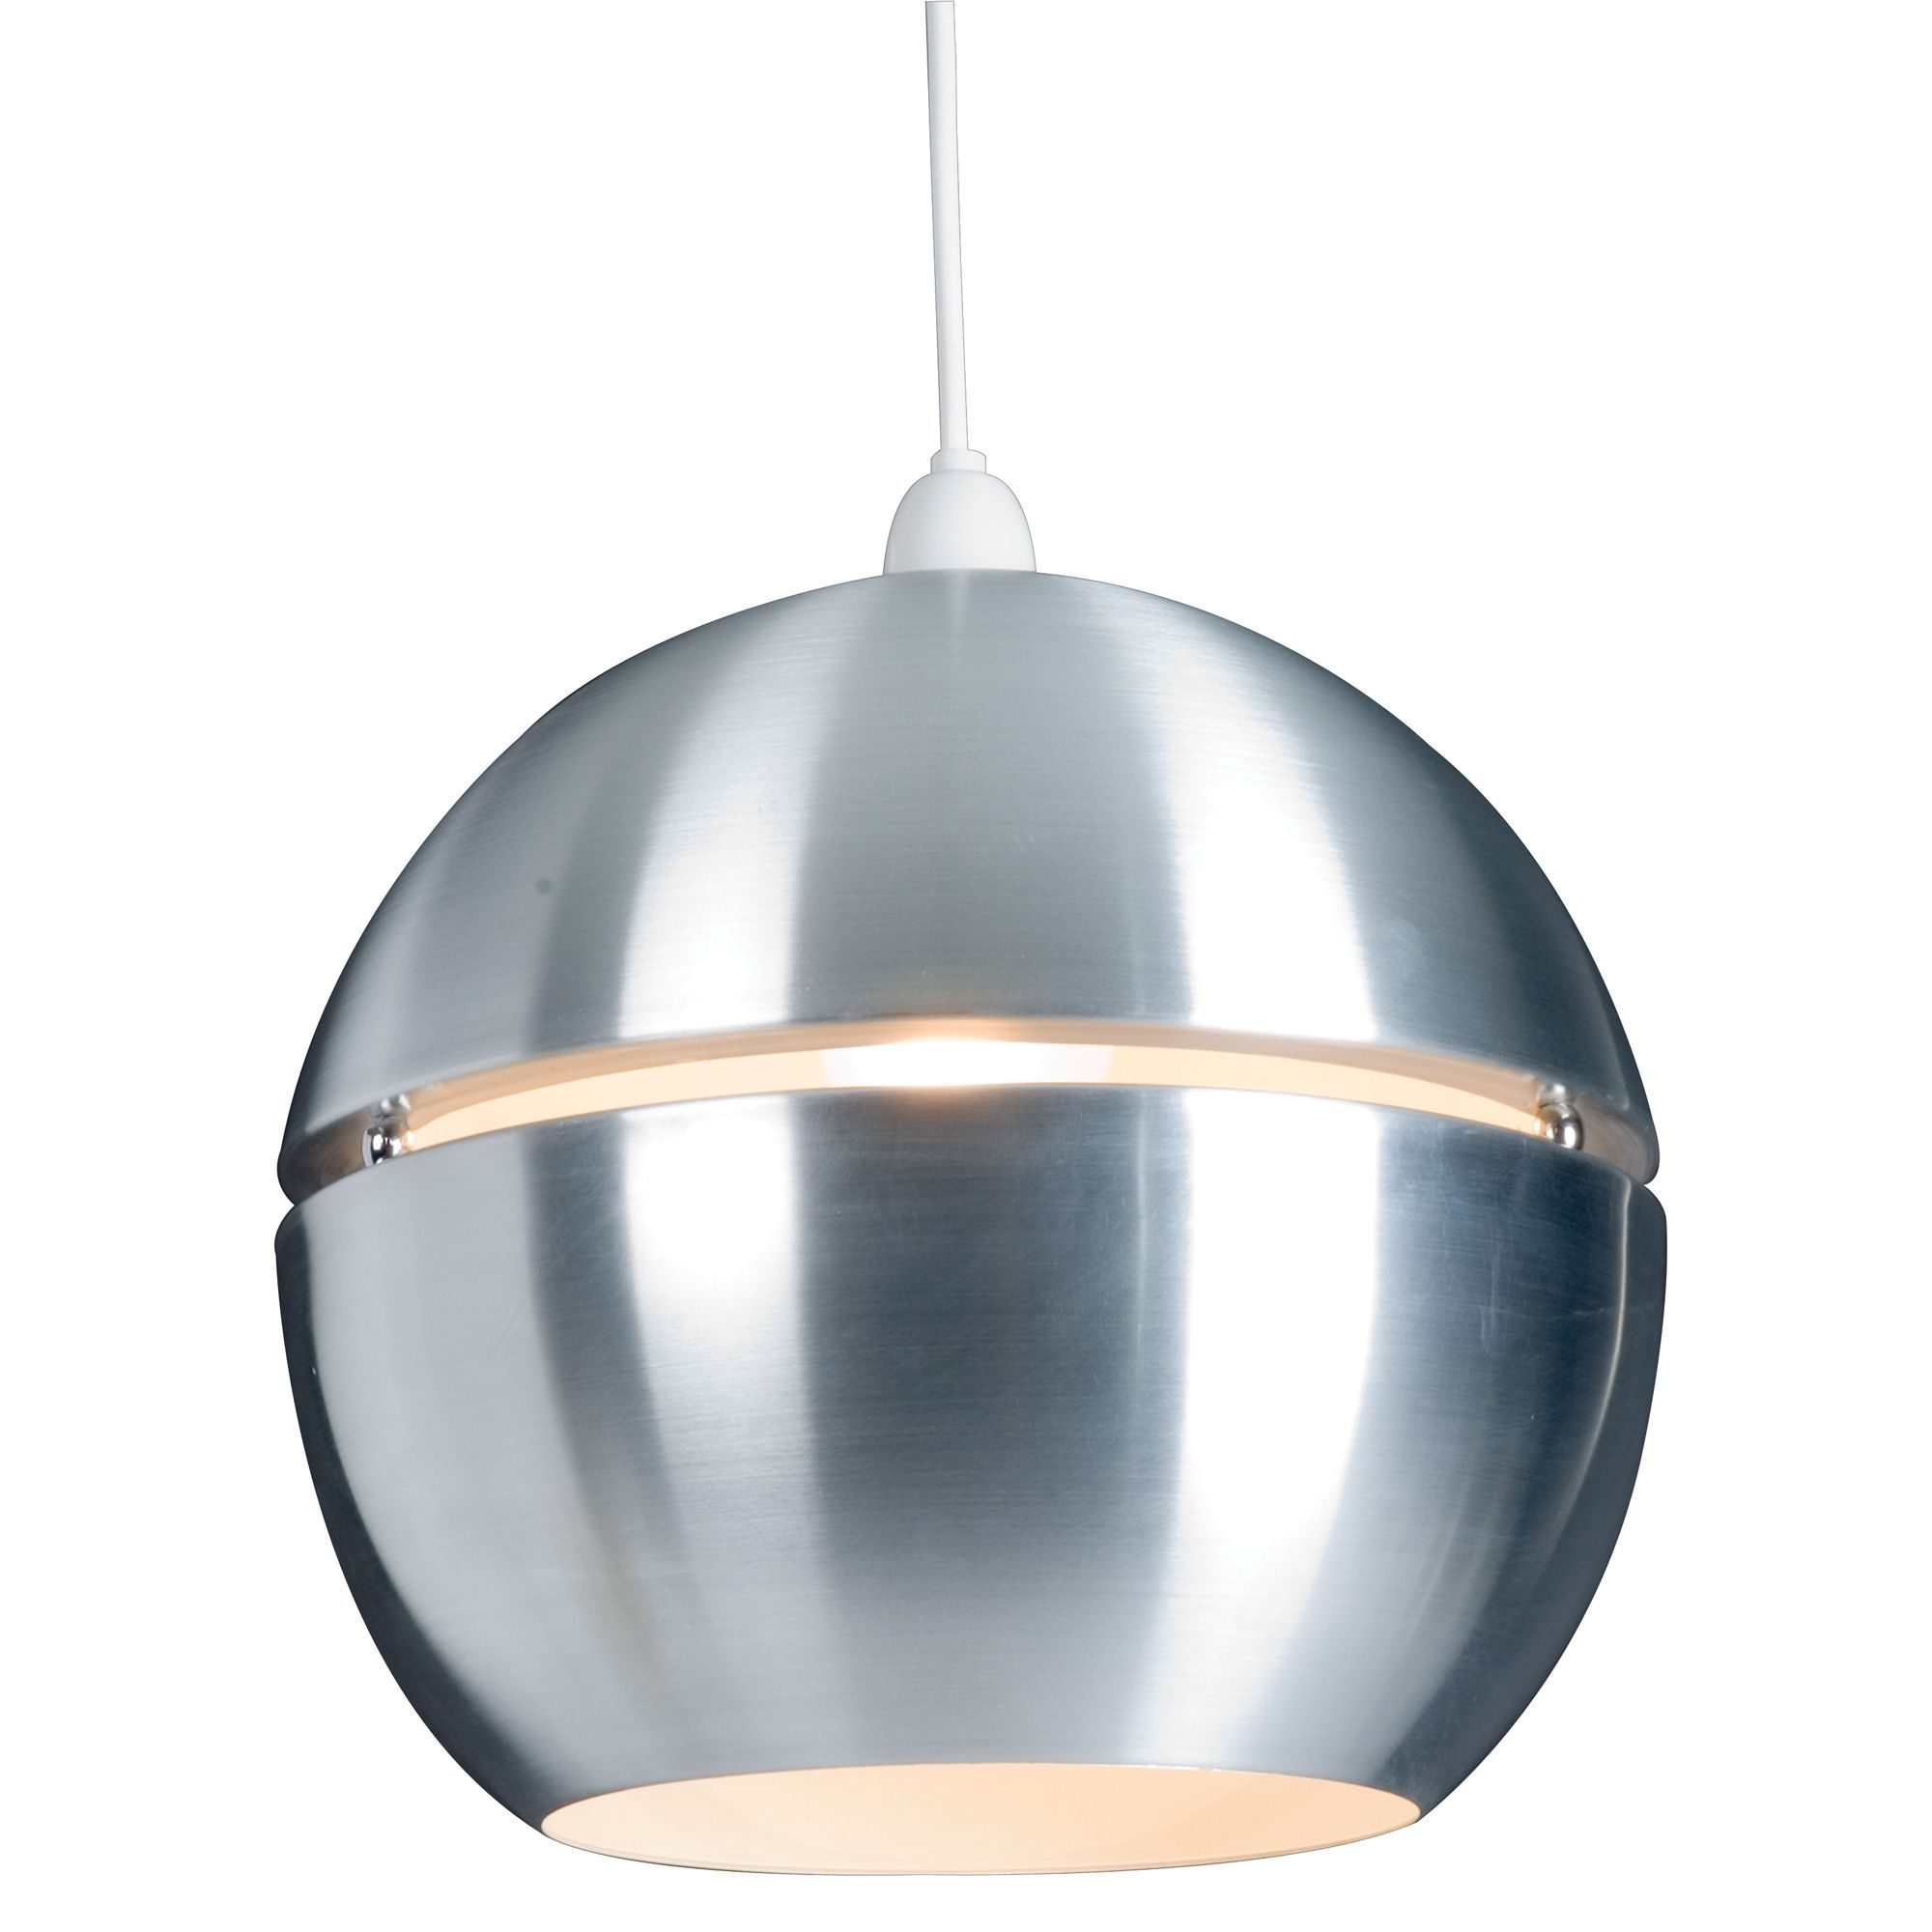 Rainbow aluminium spherical pendant light shade pendant lighting lights by bq rainbow aluminium effect spherical light shade departments diy at bq aloadofball Image collections